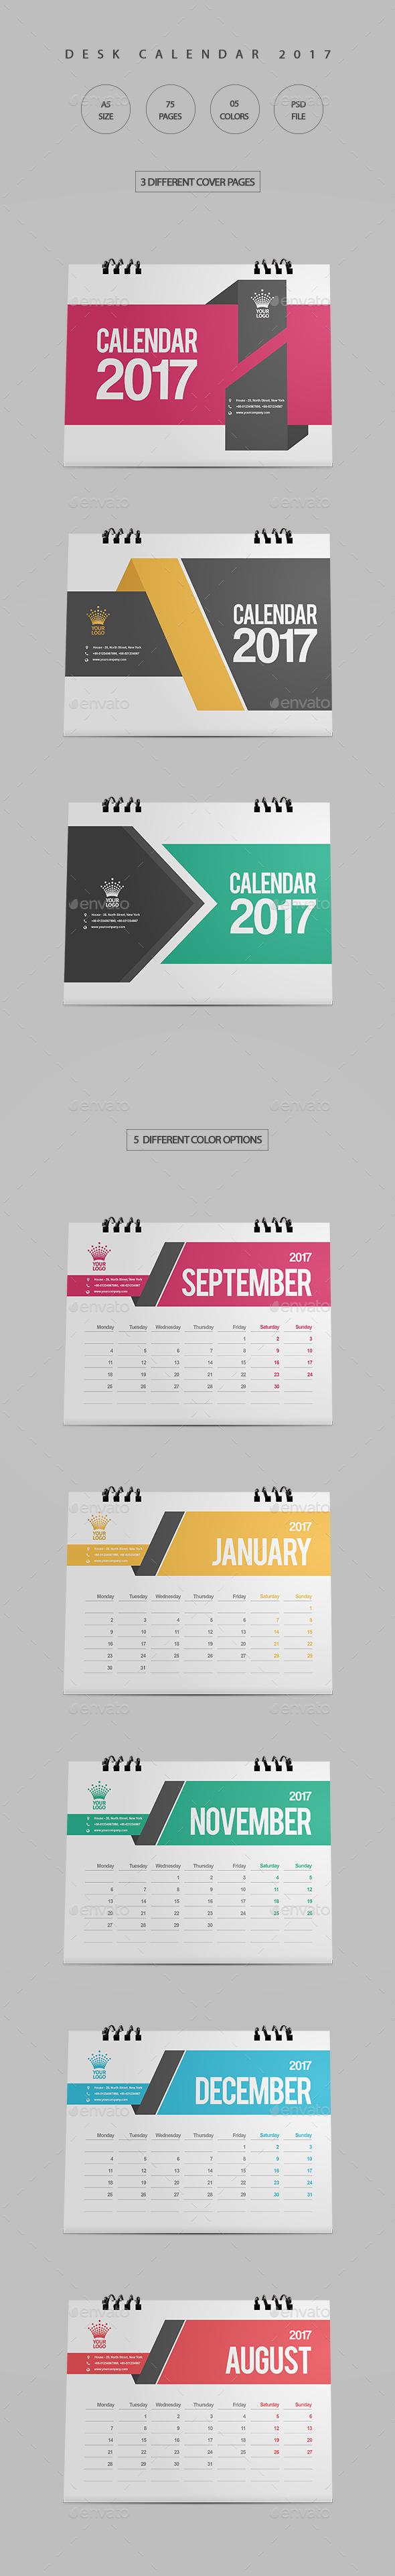 Clean Desk Calendar 2017 - Calendars Stationery